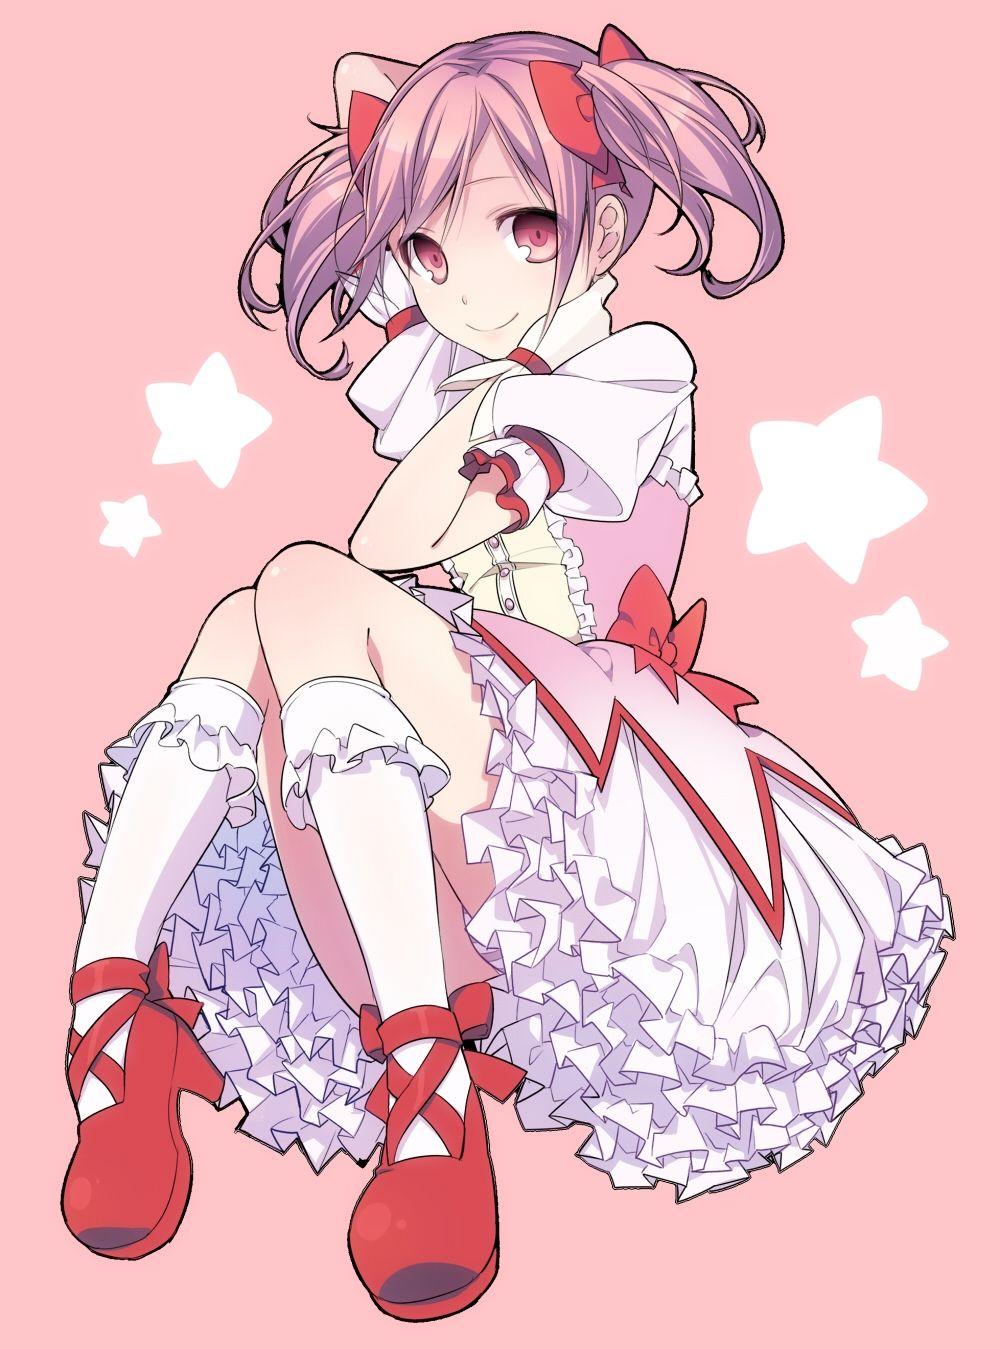 Pin by でめっち ``☂ on Anime ``☂ Madoka magica, Anime art